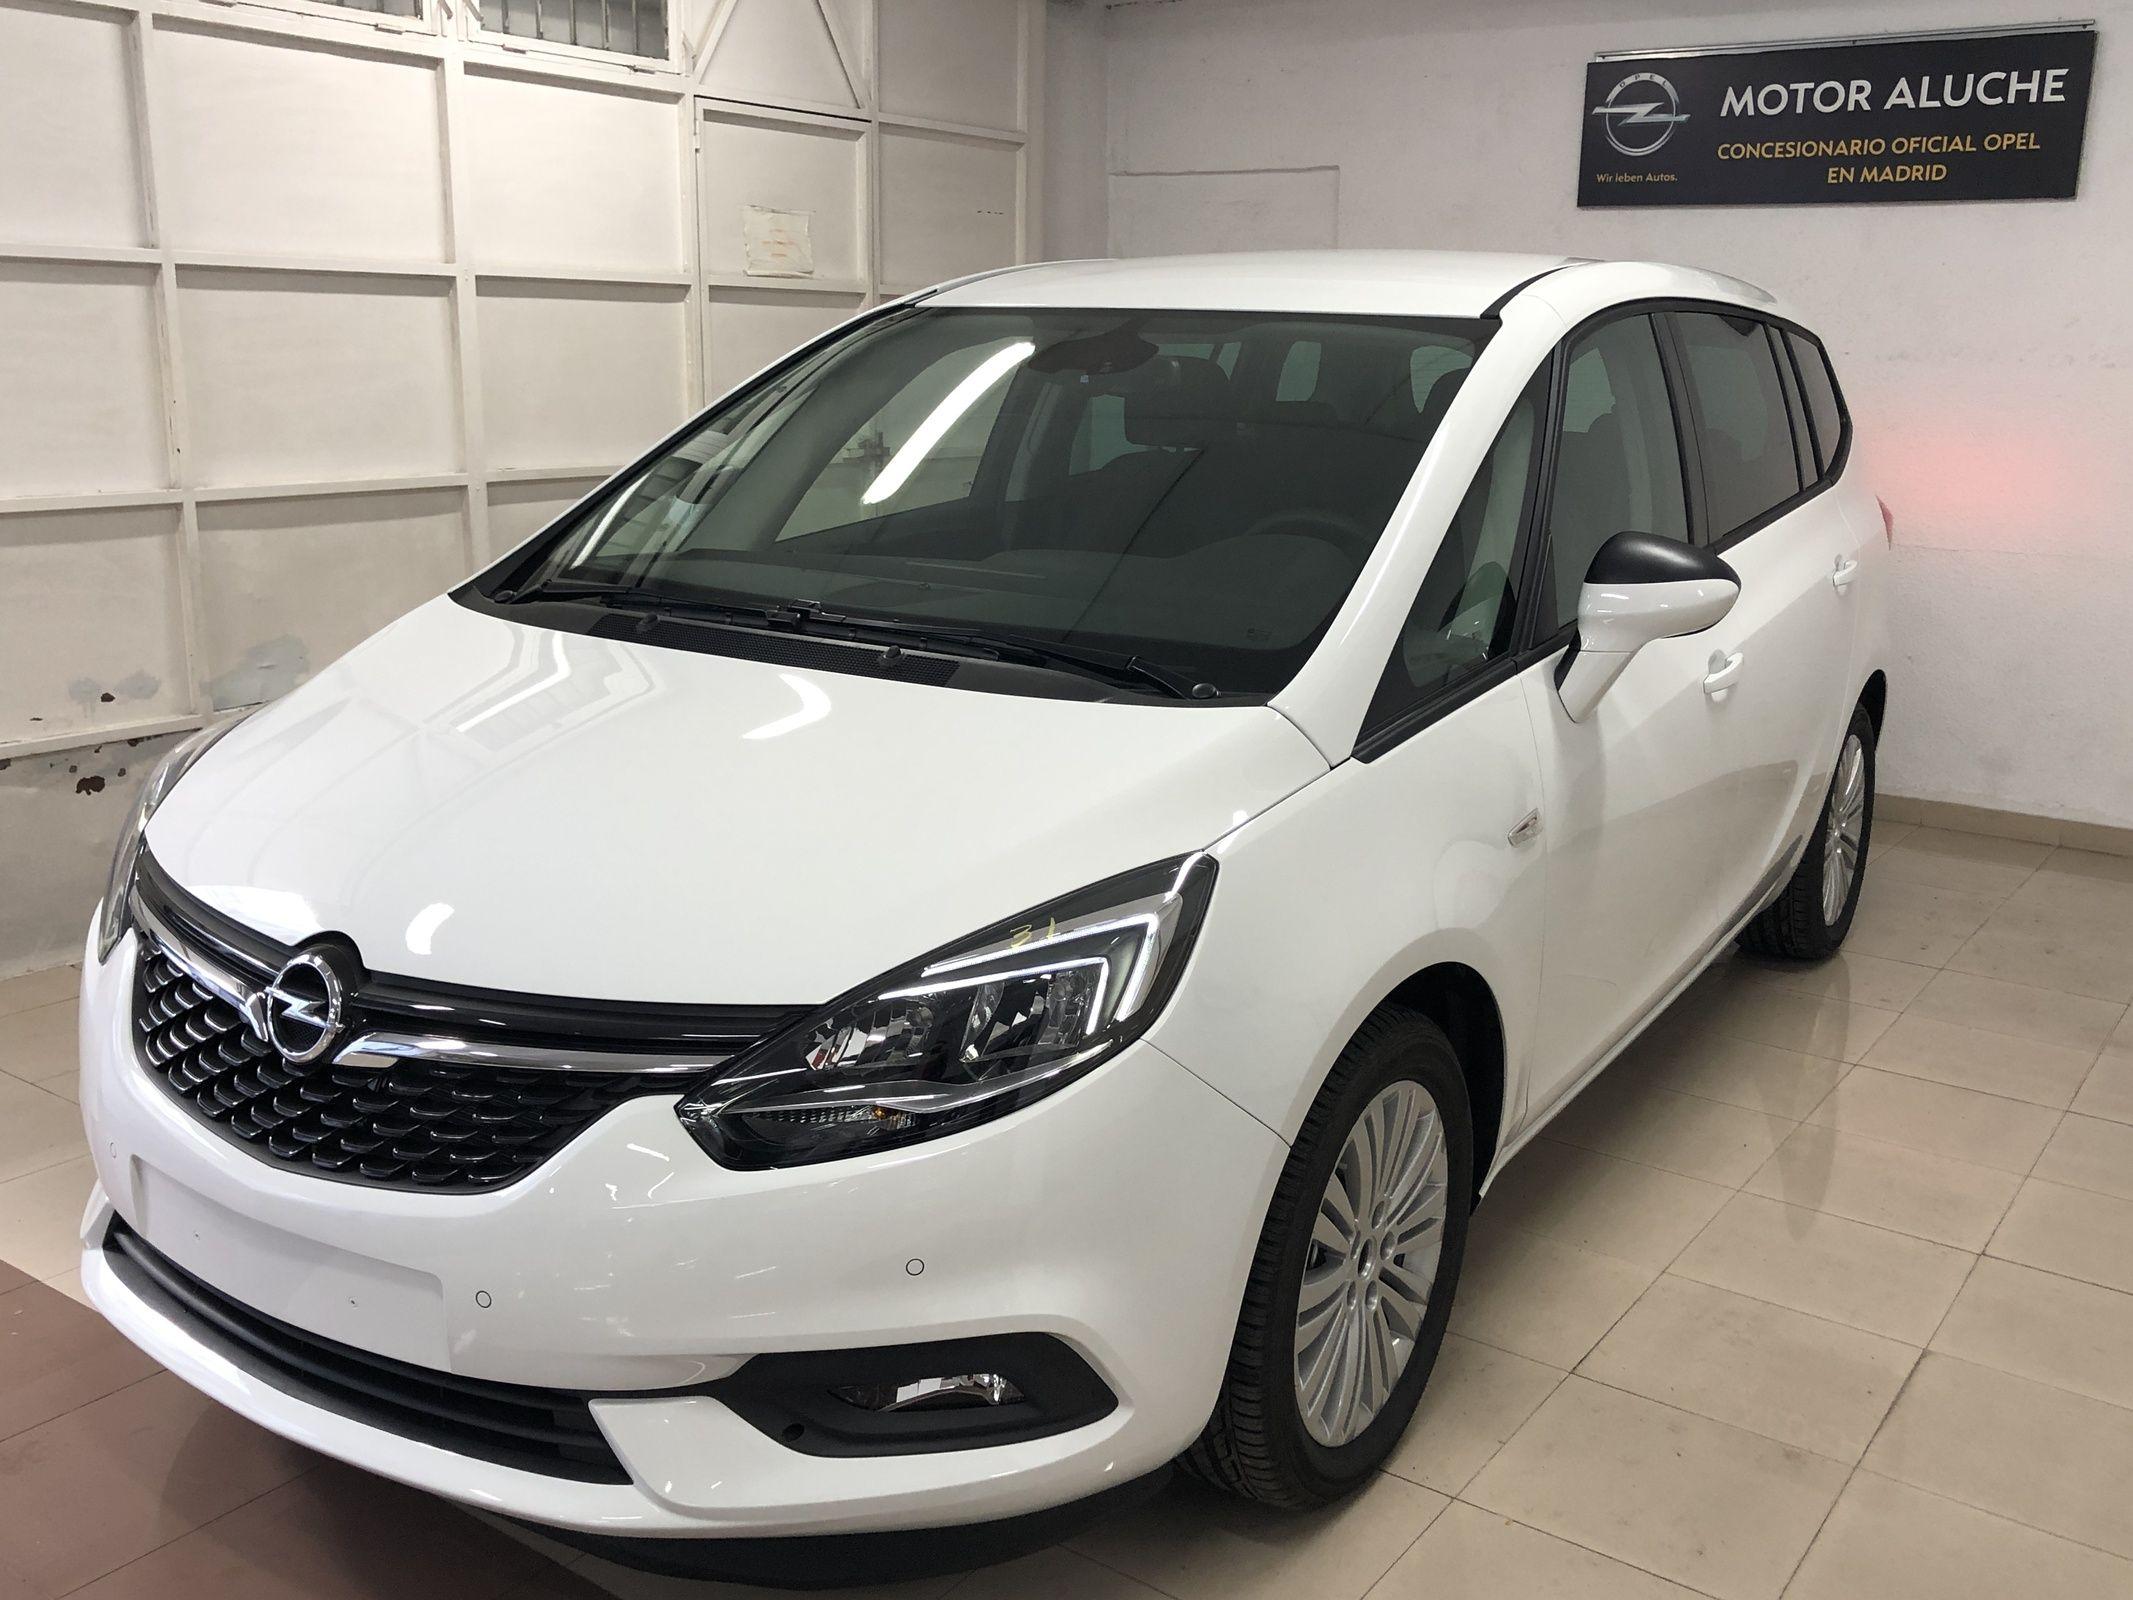 Opel Zafira Selective 1.6T S&S (136CV) desde 19.225€